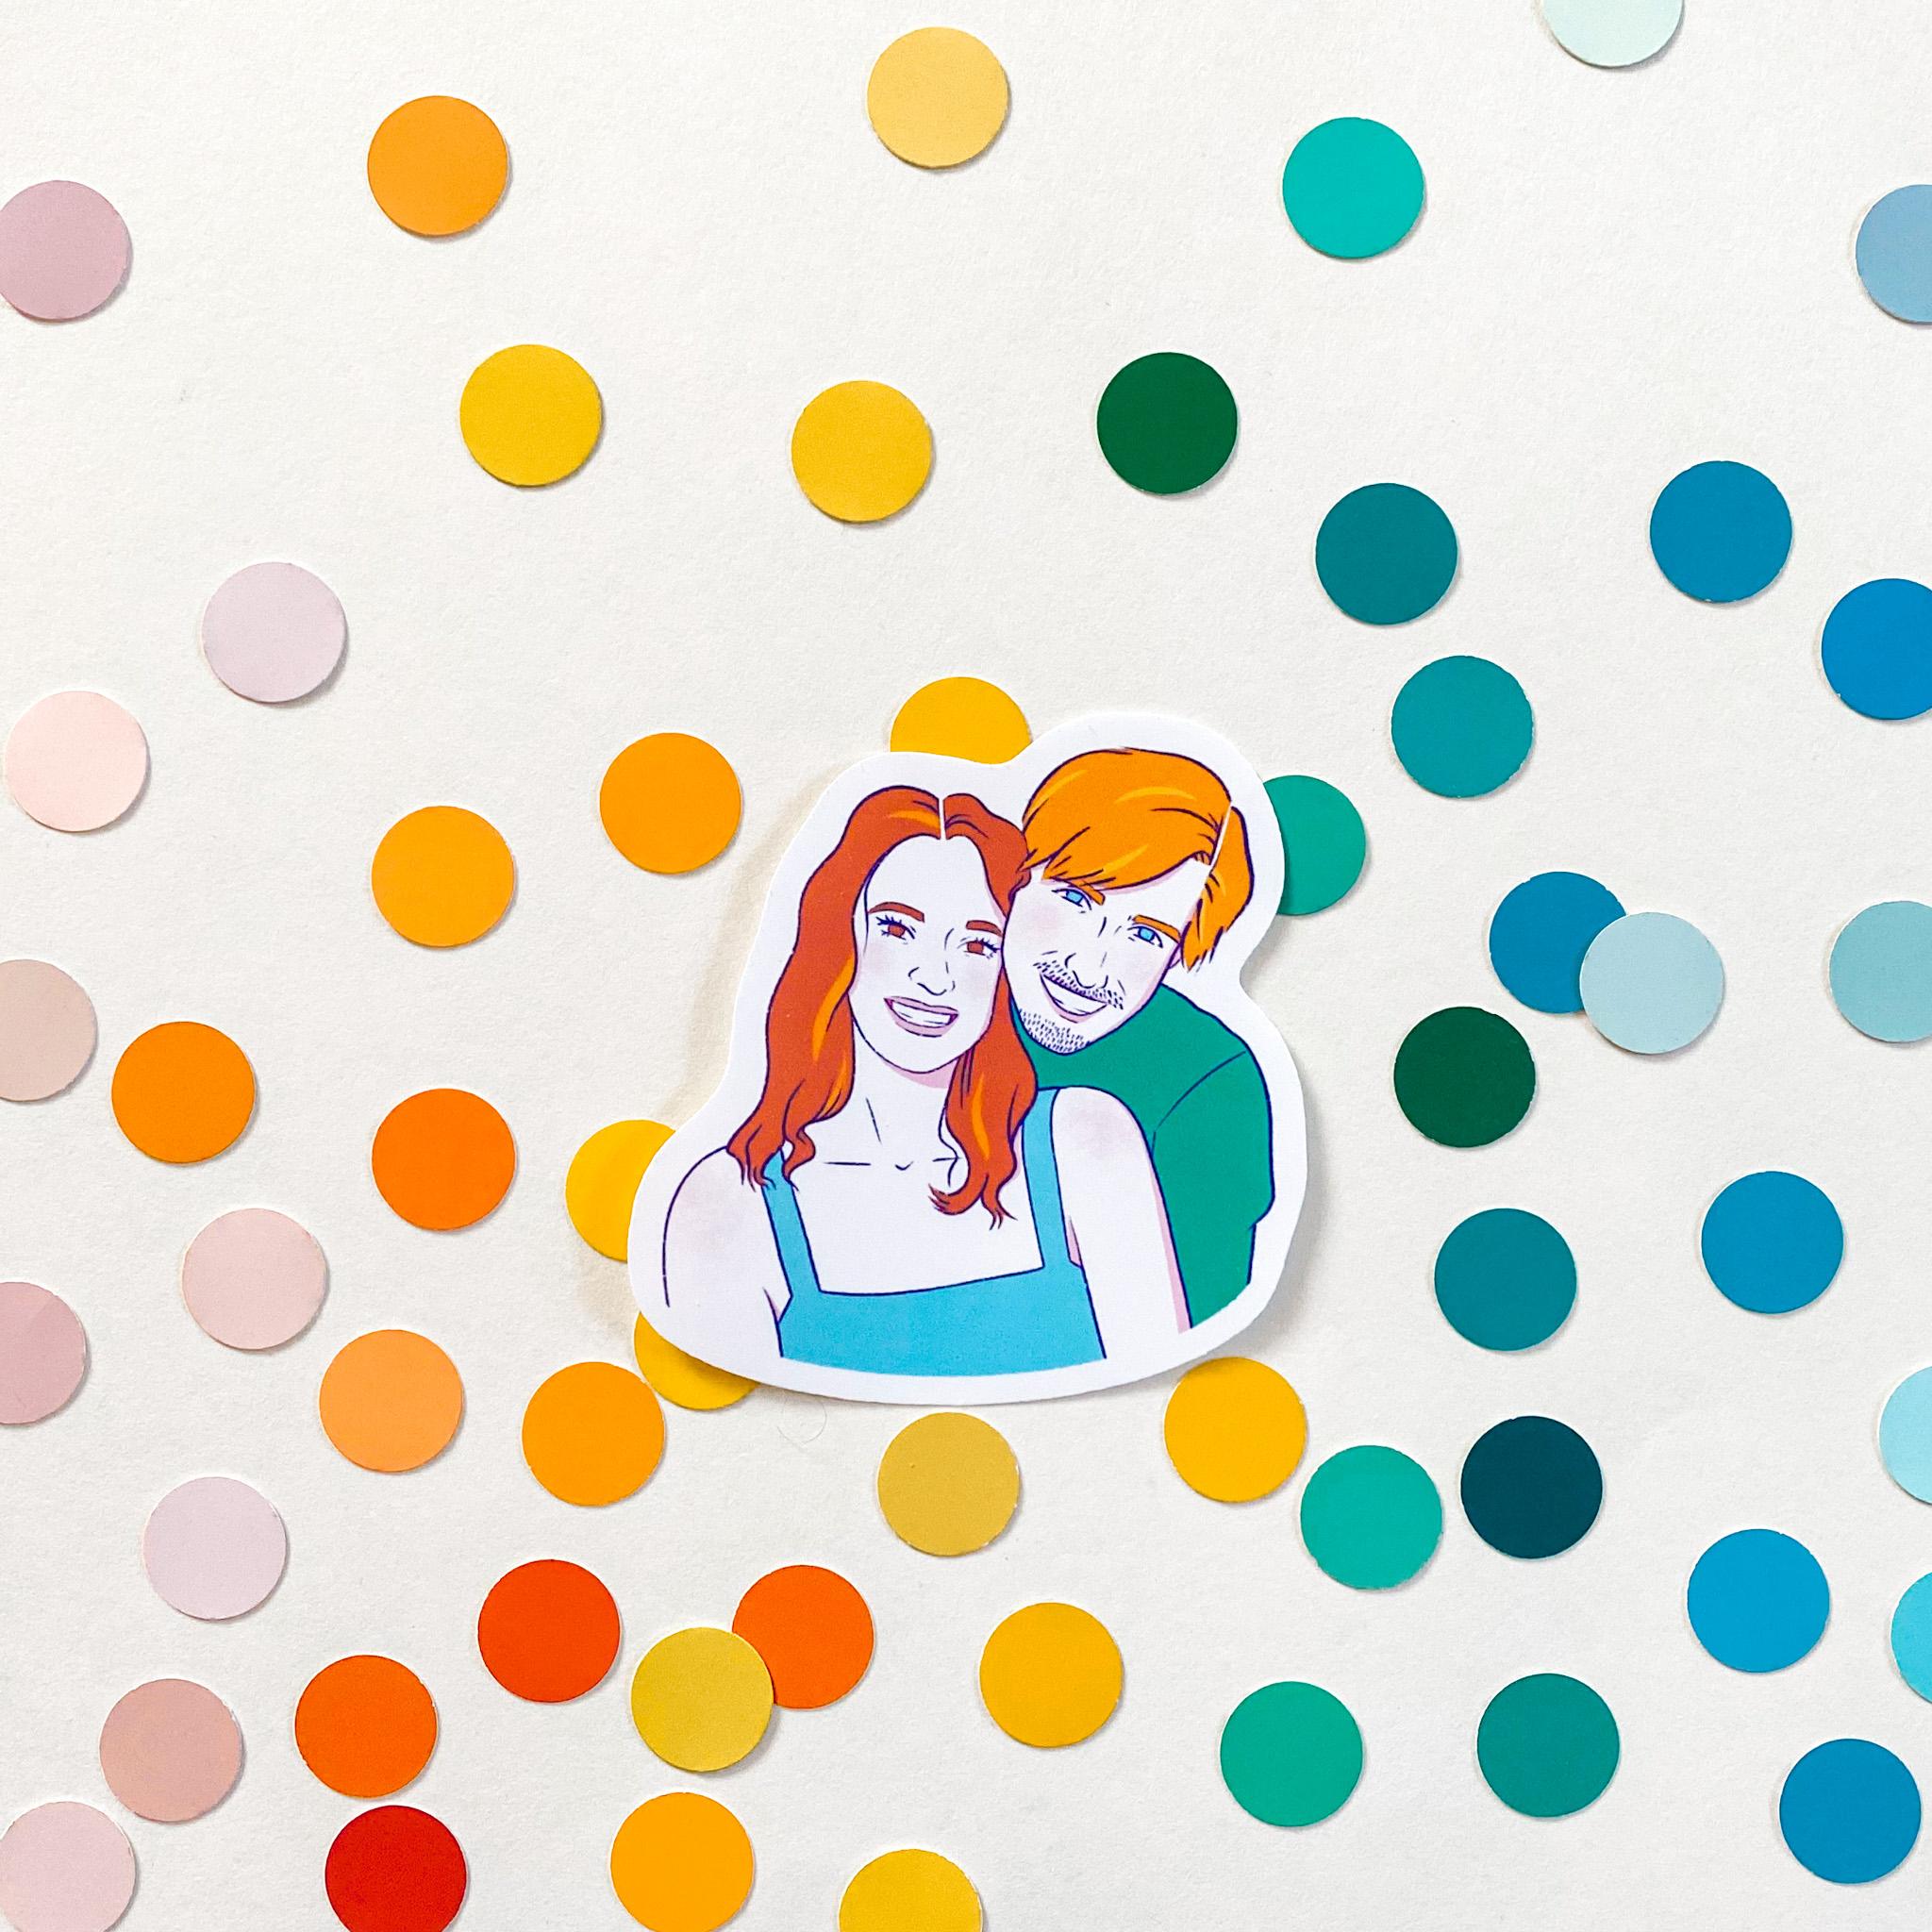 Custom Illustrated Sticker Portraits